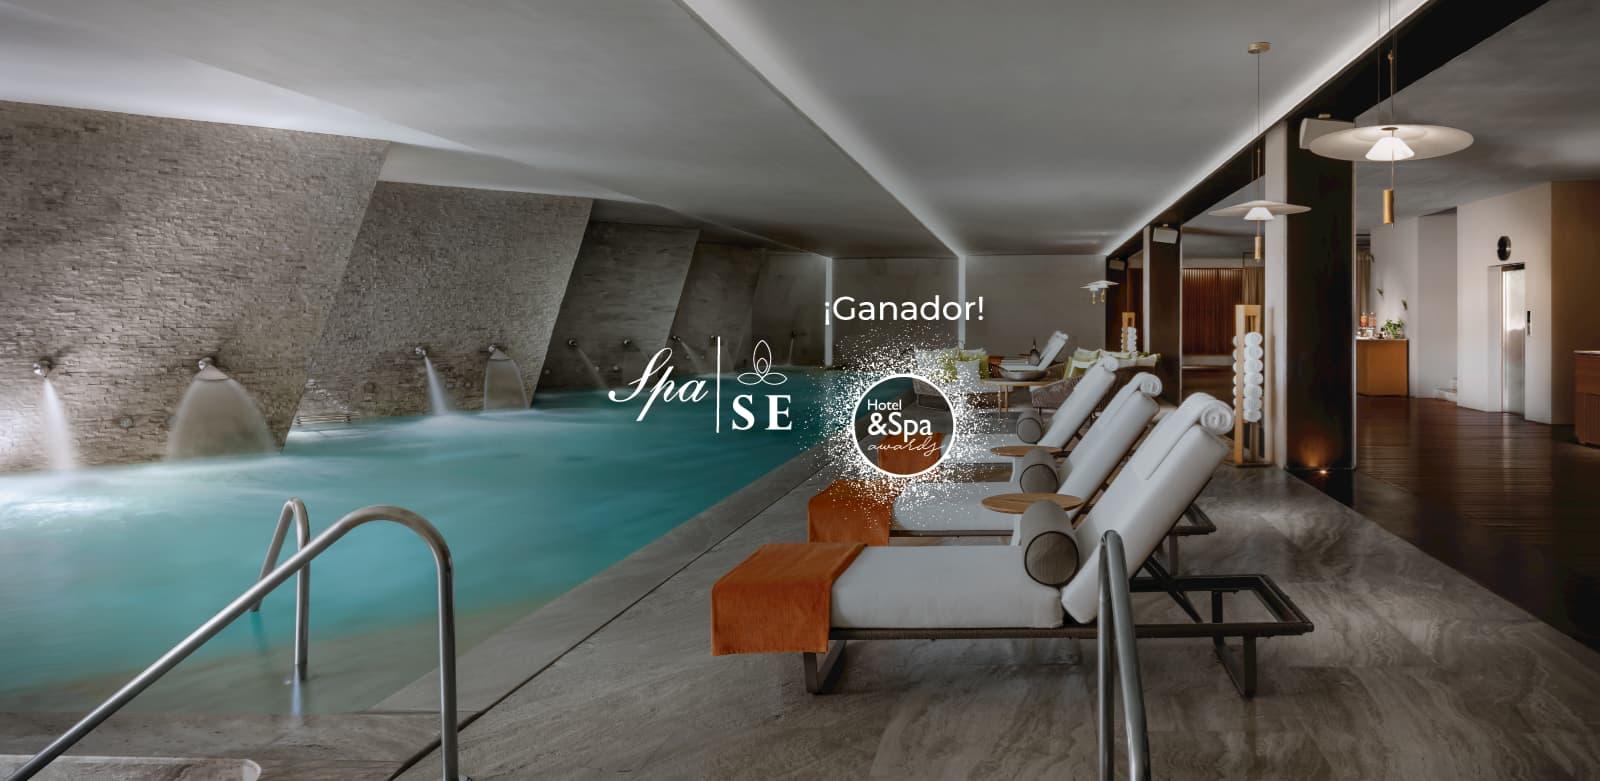 hotel and spa awards